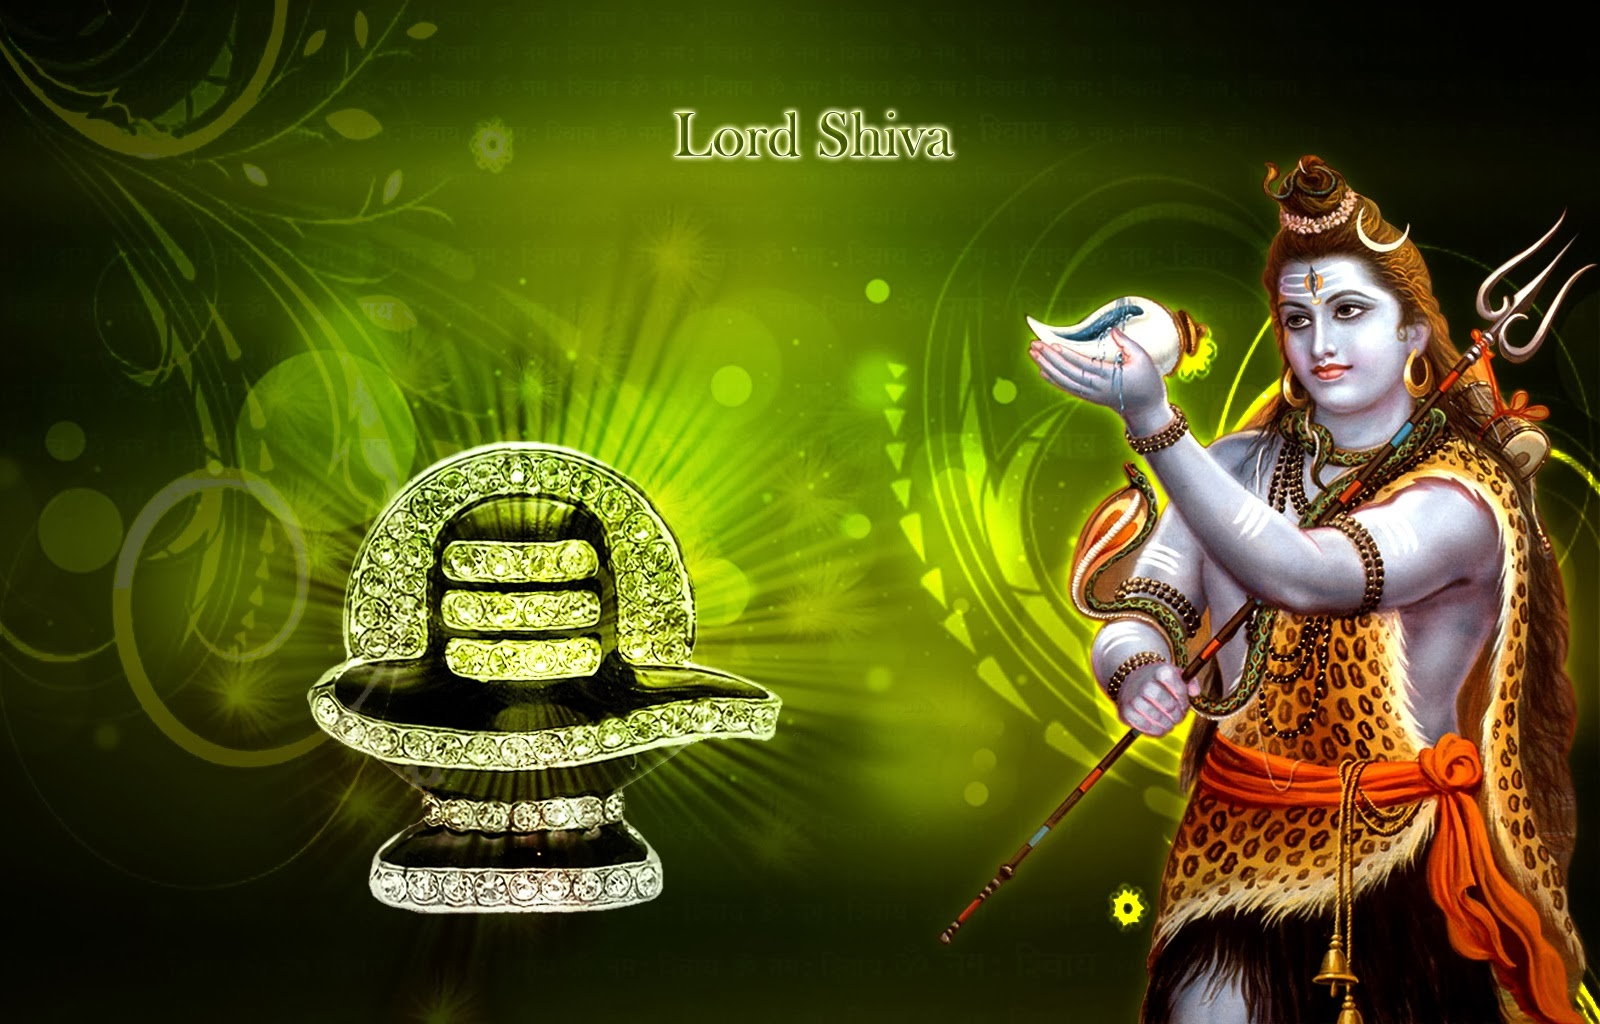 Lord Shiva Graphic Images: Best Photos Of Shivling, Bholenath Mahadev Images